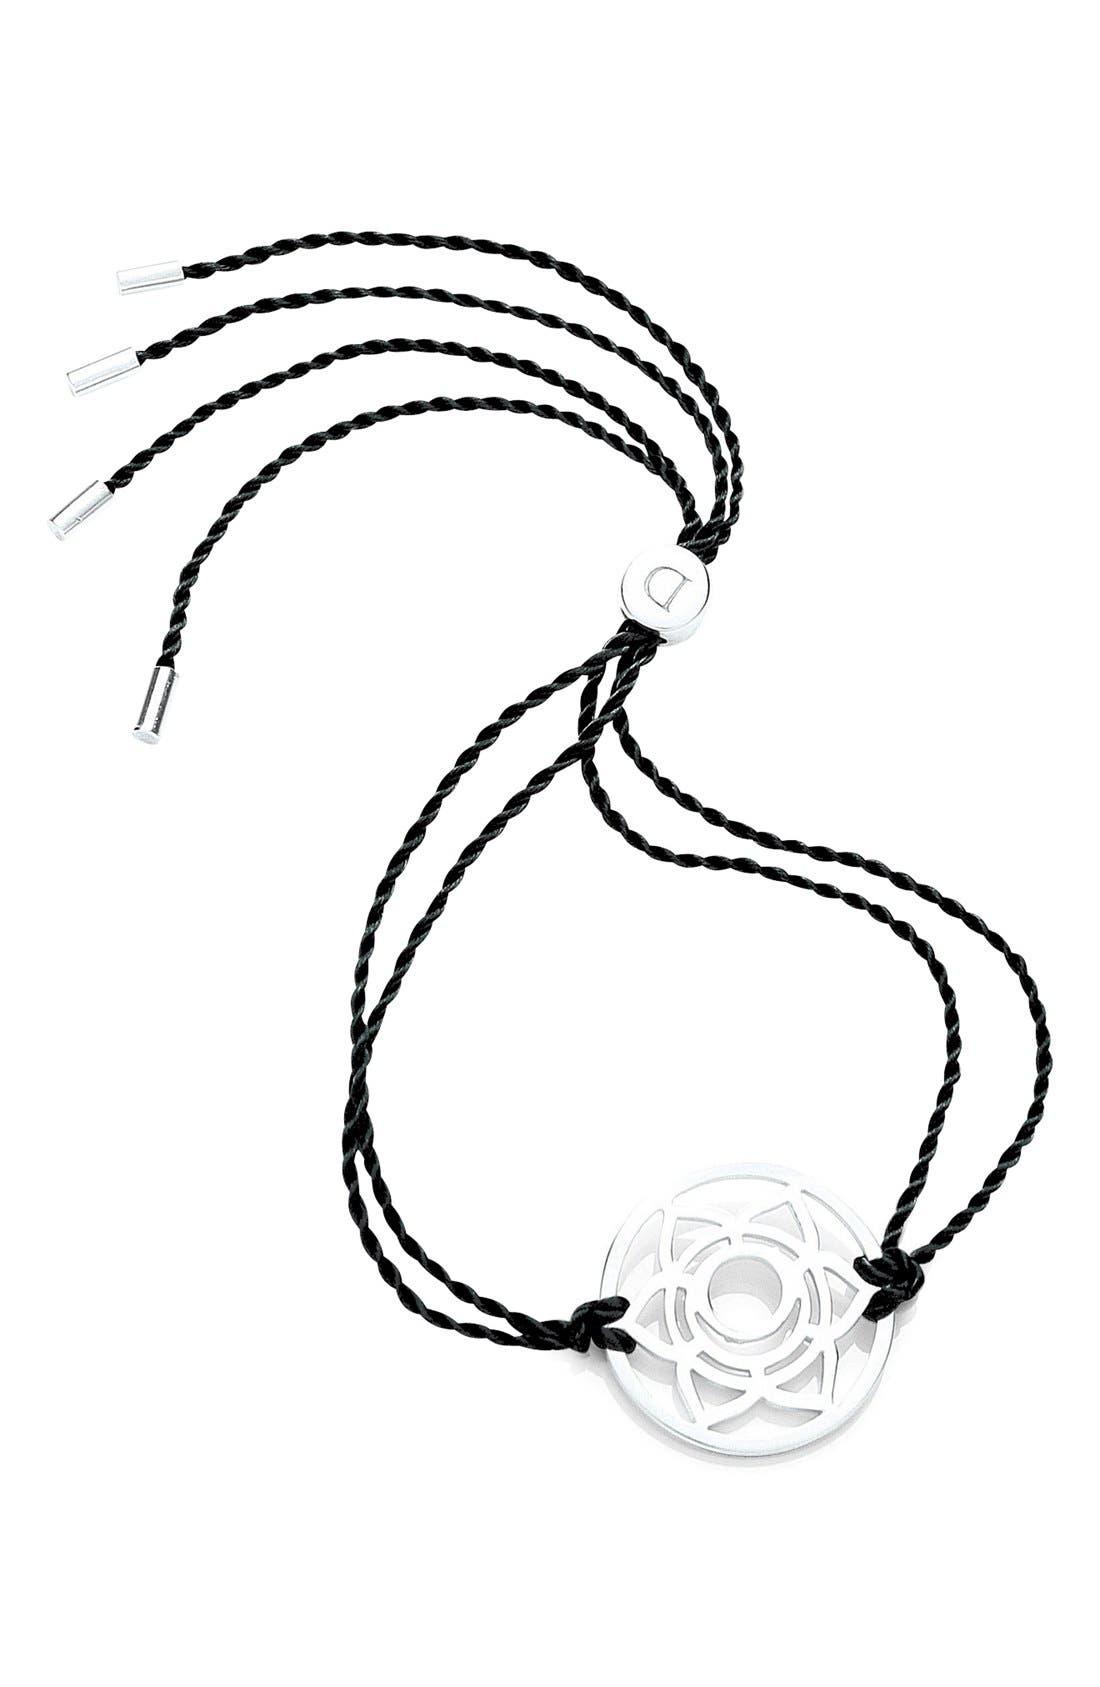 'Sacral Chakra' Cord Bracelet,                             Main thumbnail 1, color,                             925 Sterling Silver/Black